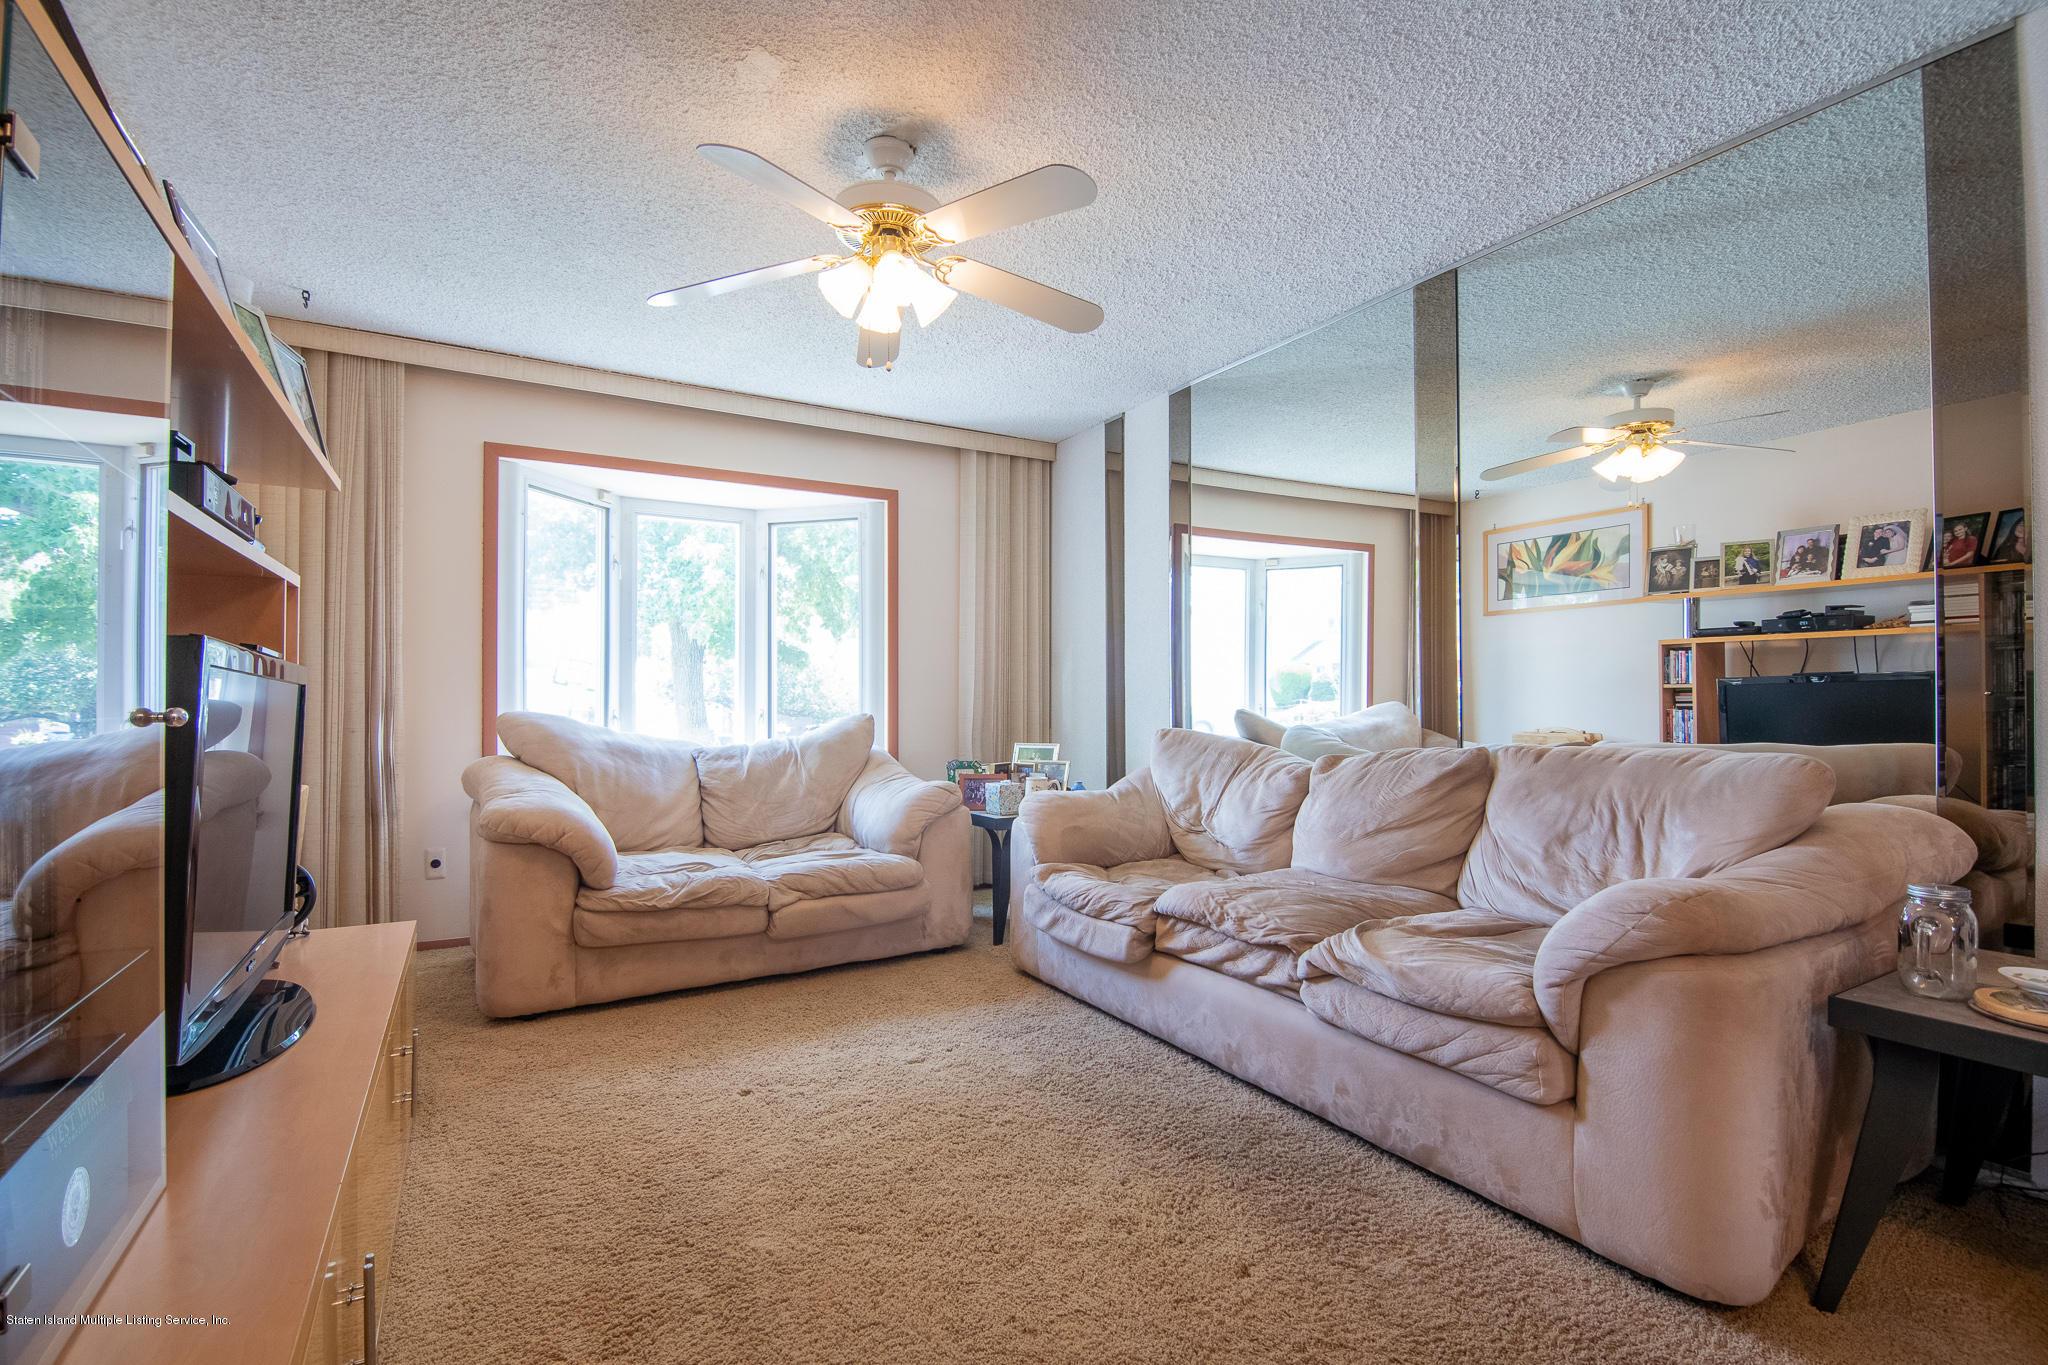 Single Family - Semi-Attached 337 Brookfield Avenue  Staten Island, NY 10308, MLS-1131002-3